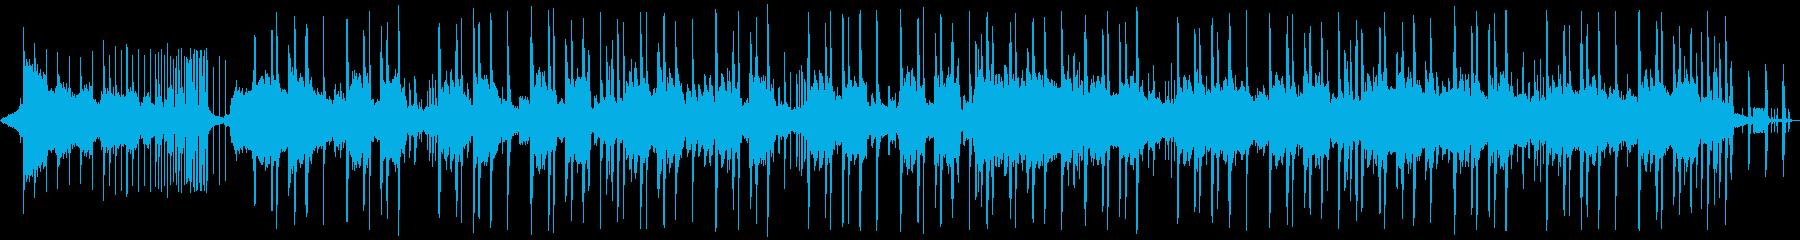 KawaiiFutureBass60秒版の再生済みの波形